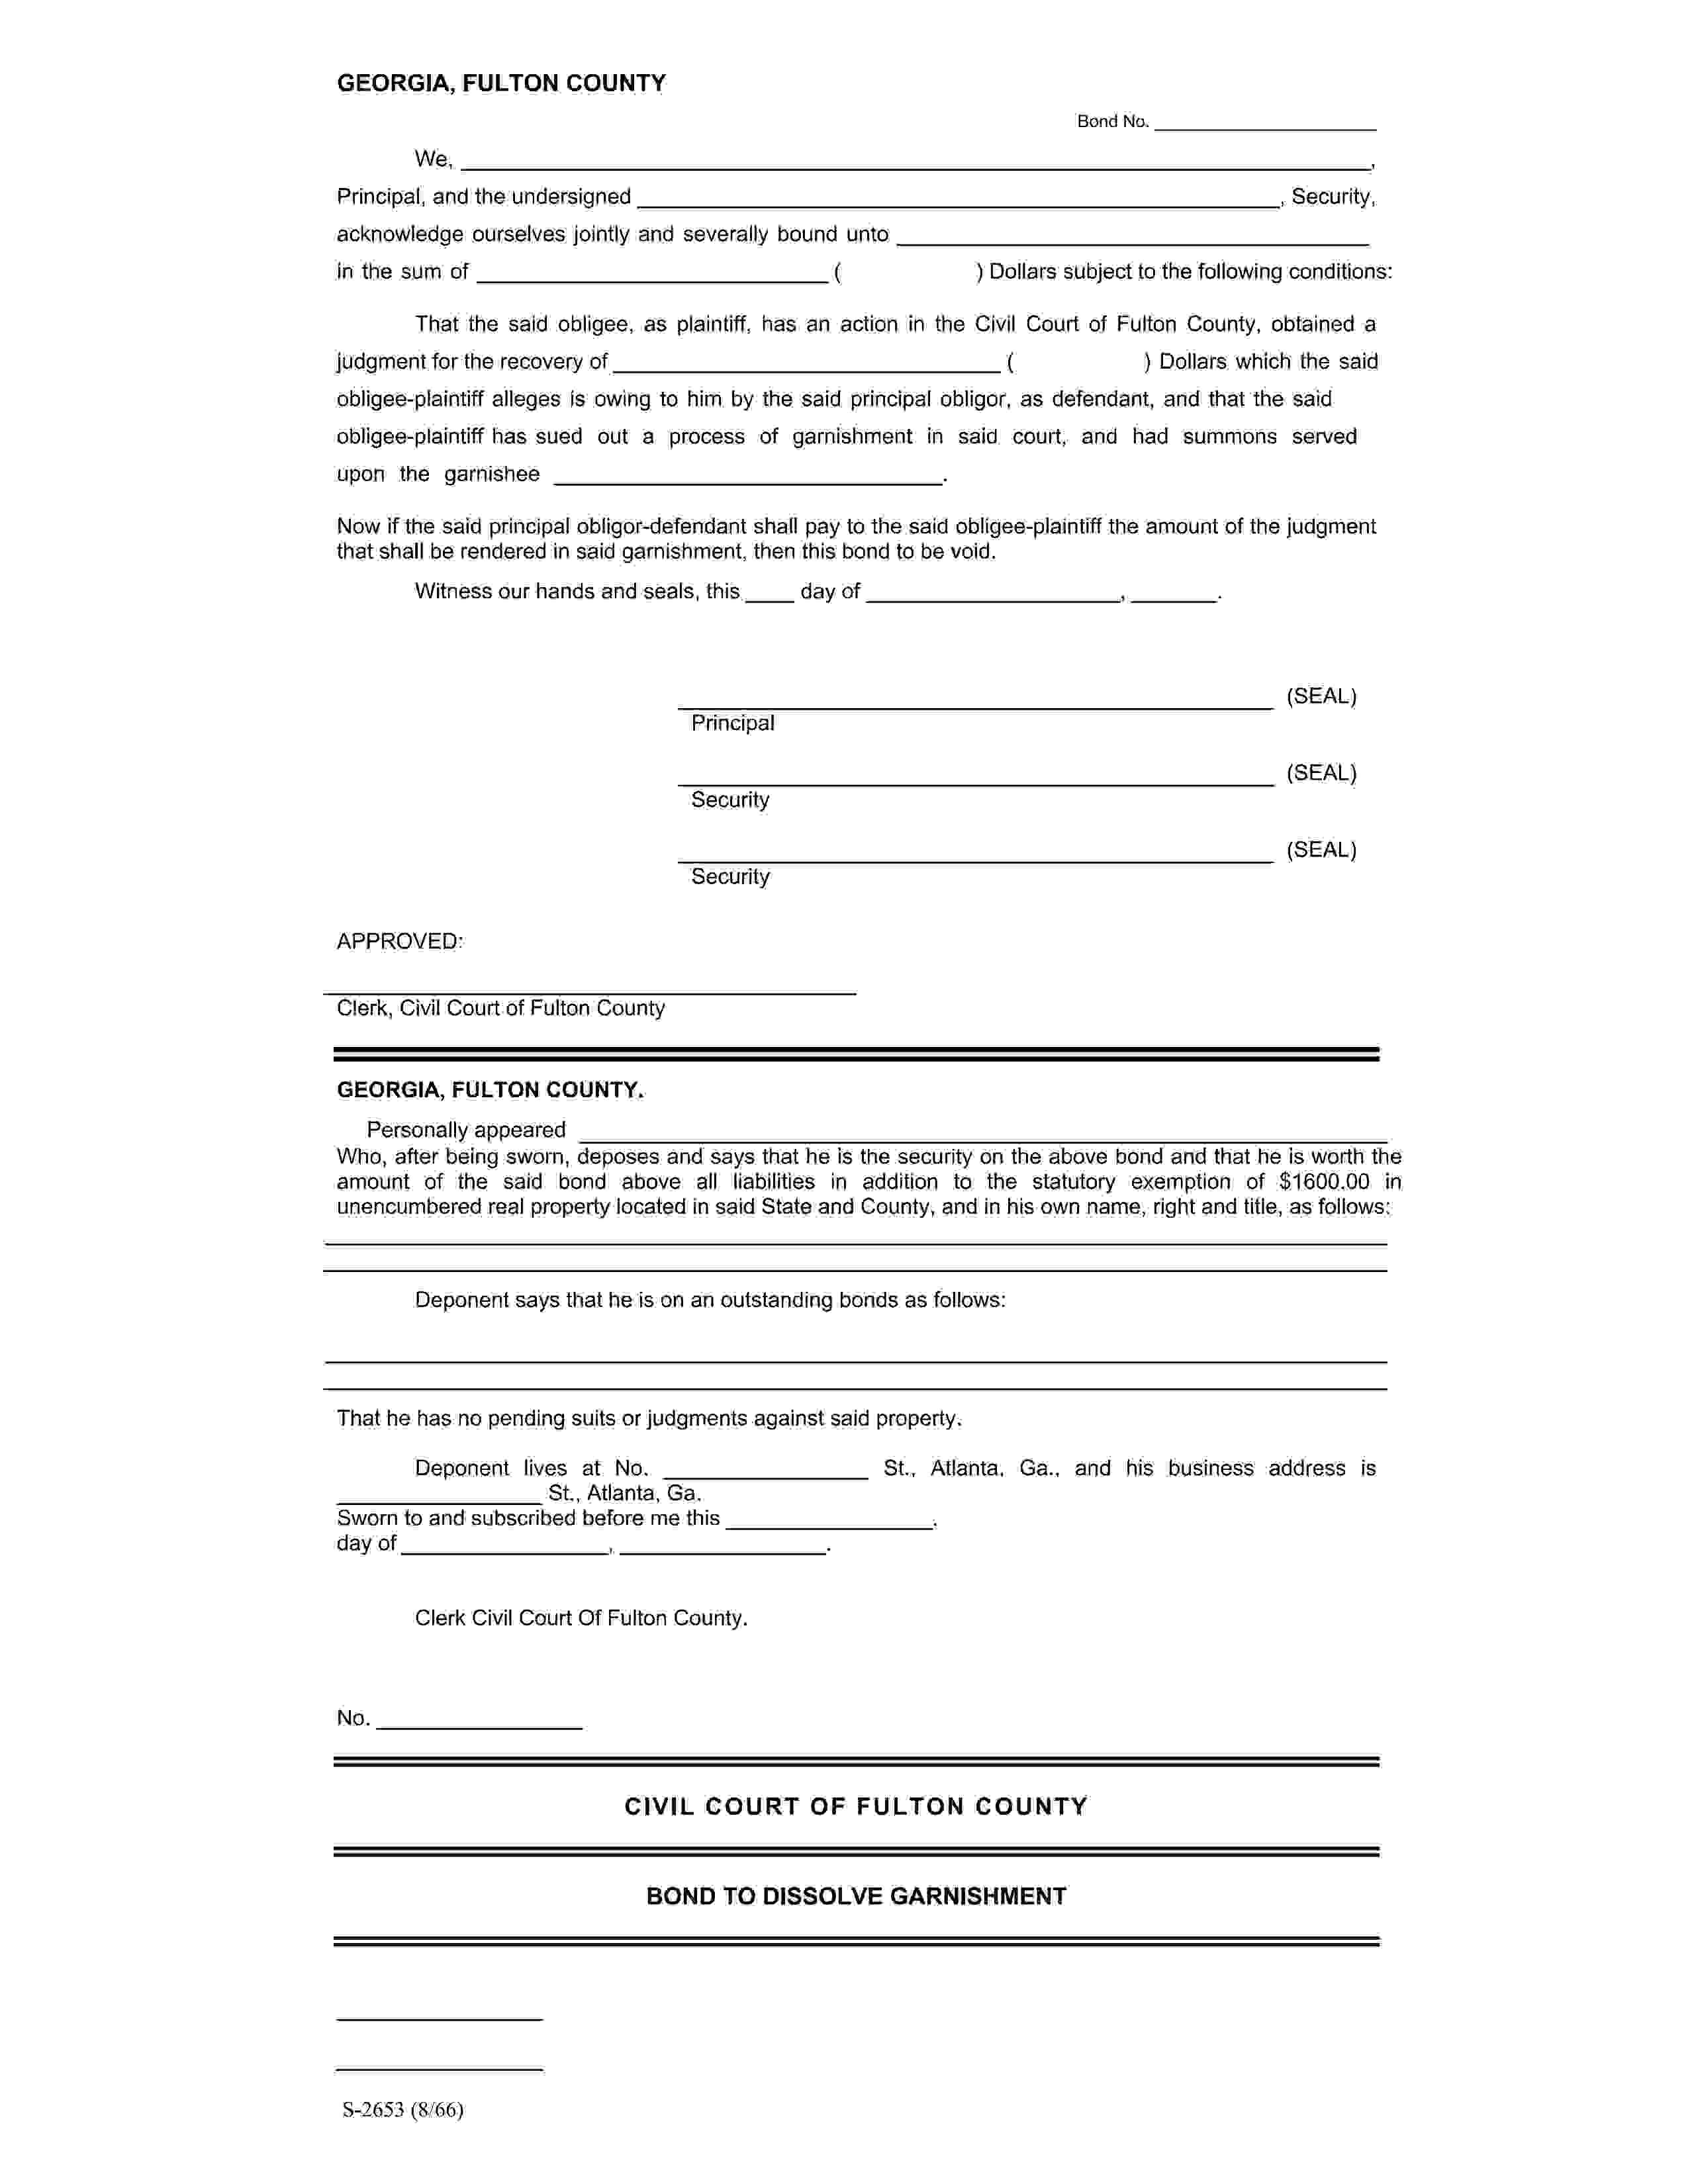 Fulton County Court Fulton County Dissolve Garnishment Bond sample image